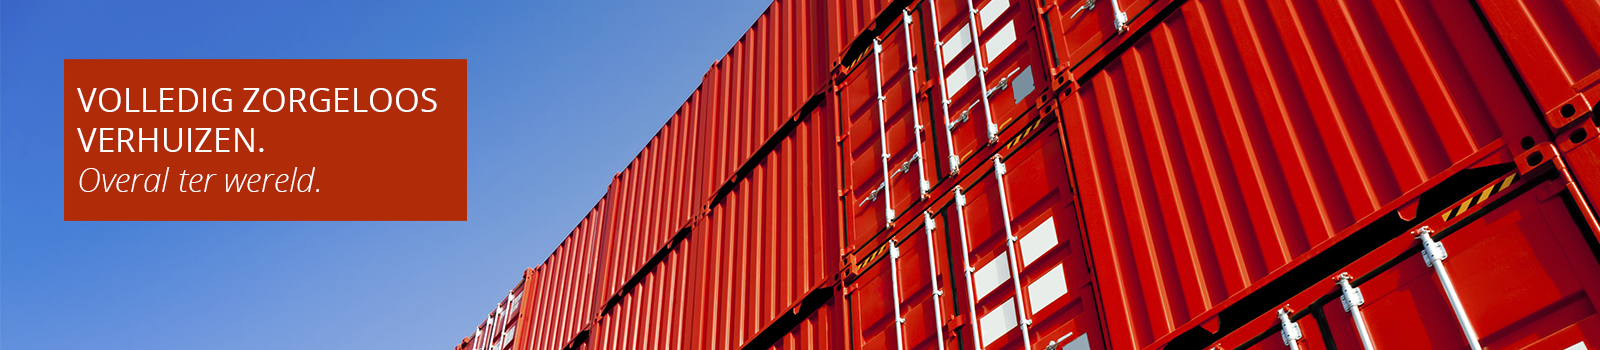 header-portholeslider-3nl-container-1600x350